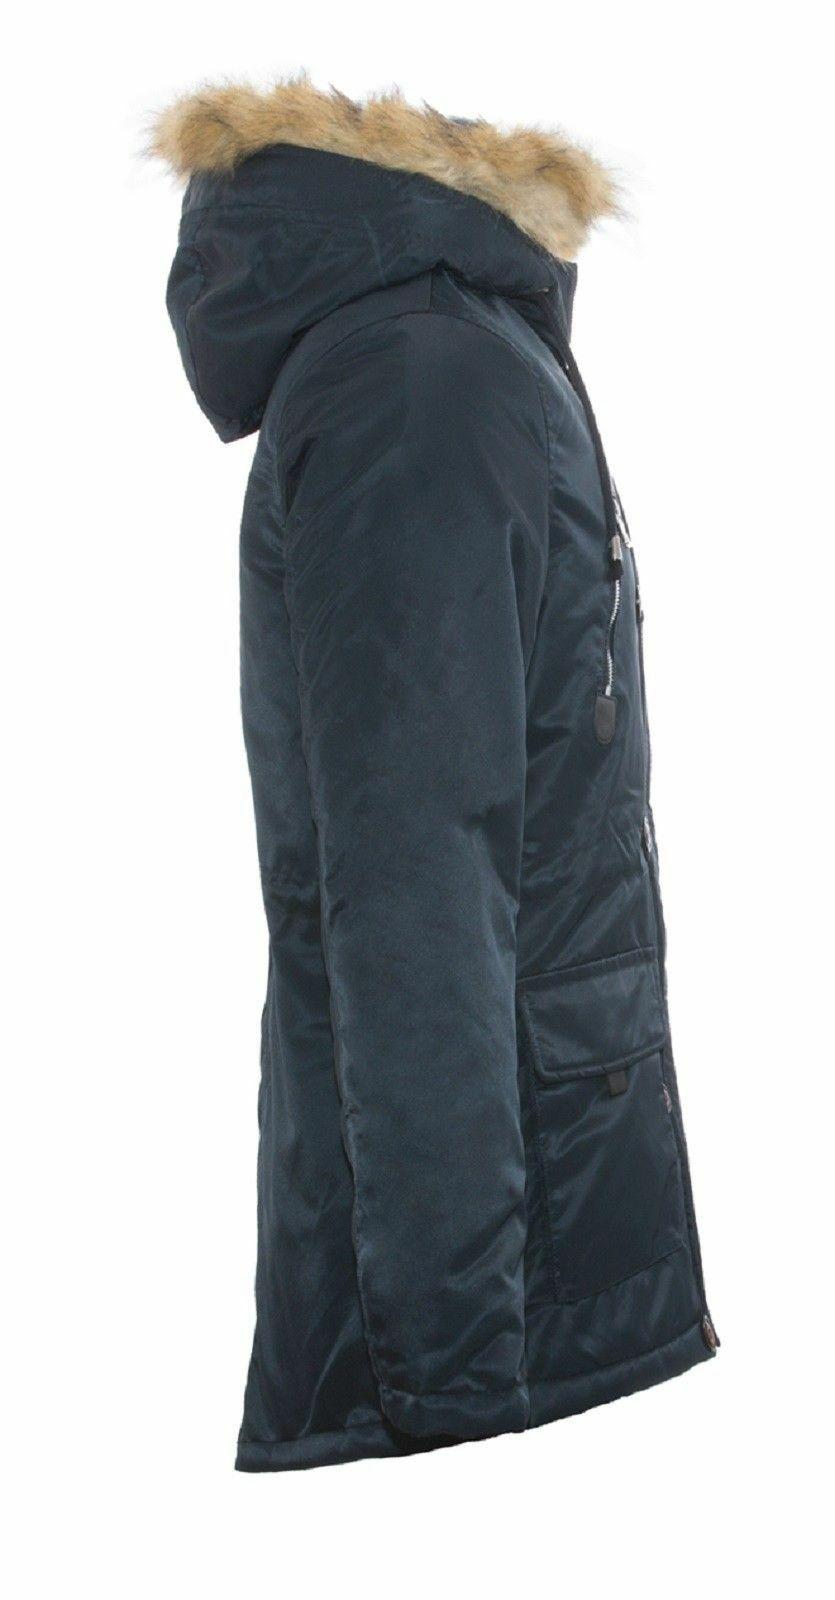 Parka-Uomo-Invernale-Giubbotto-Canadian-Pelliccia-Cappuccio-Blu-Verde miniatura 17